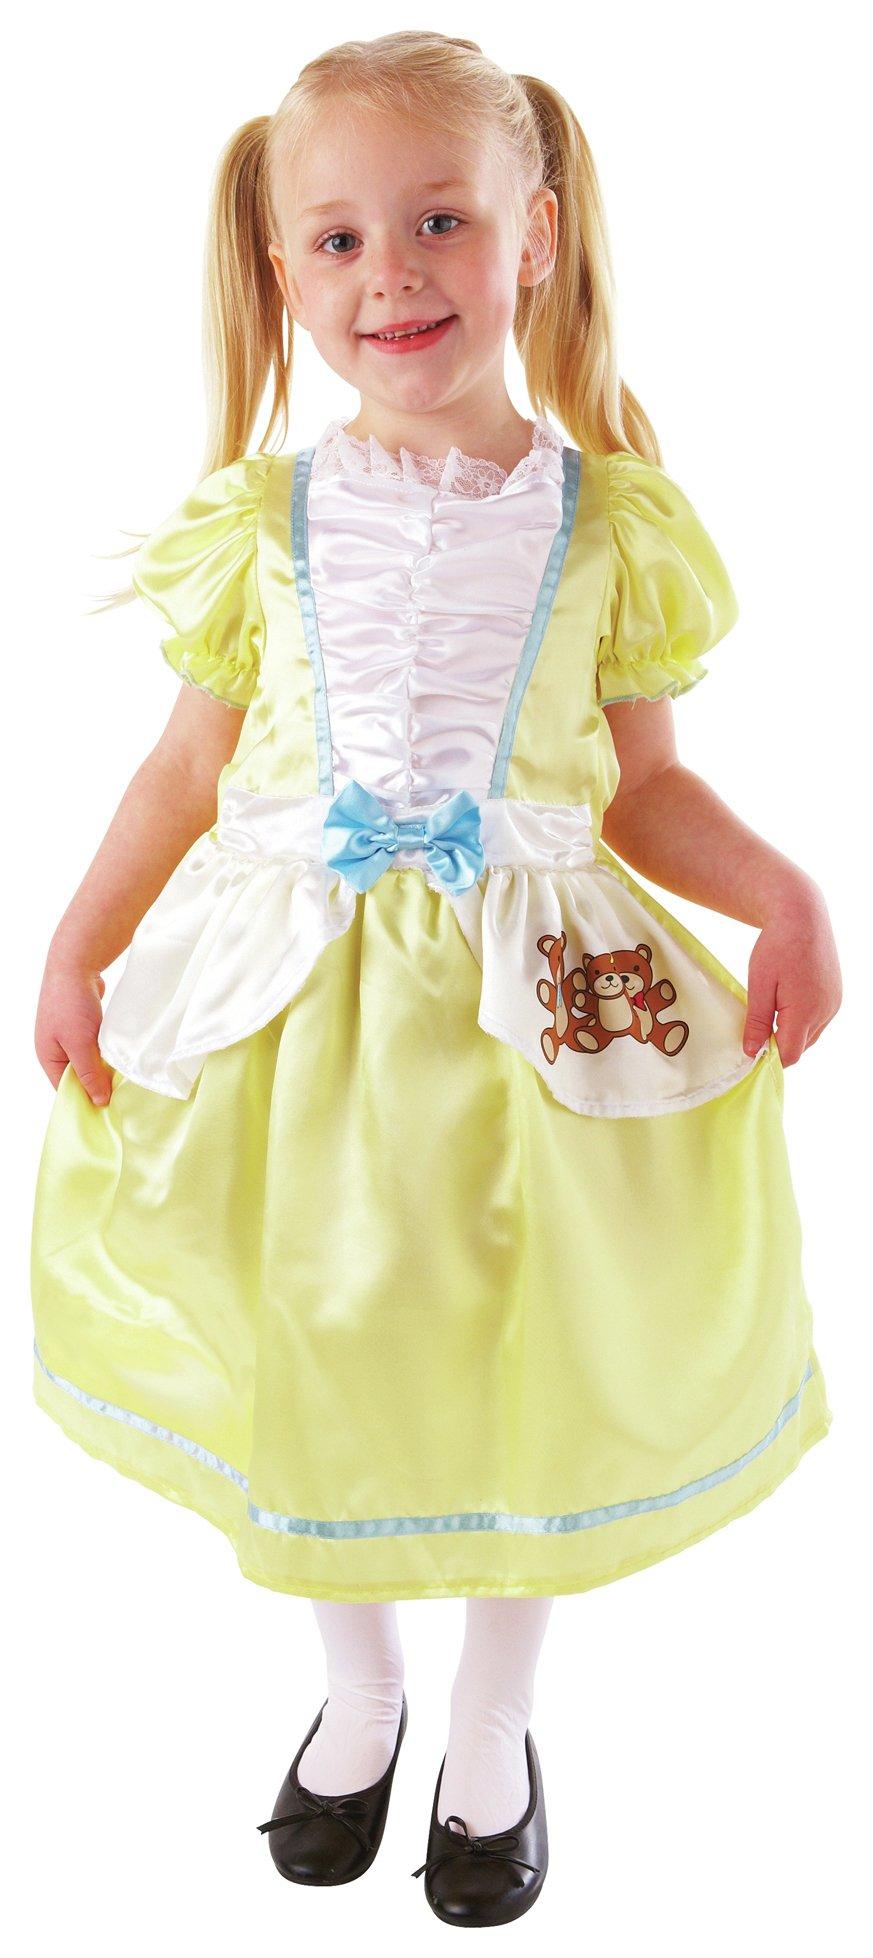 Image of Amscan Goldilocks Costume - 3 - 5 Years.